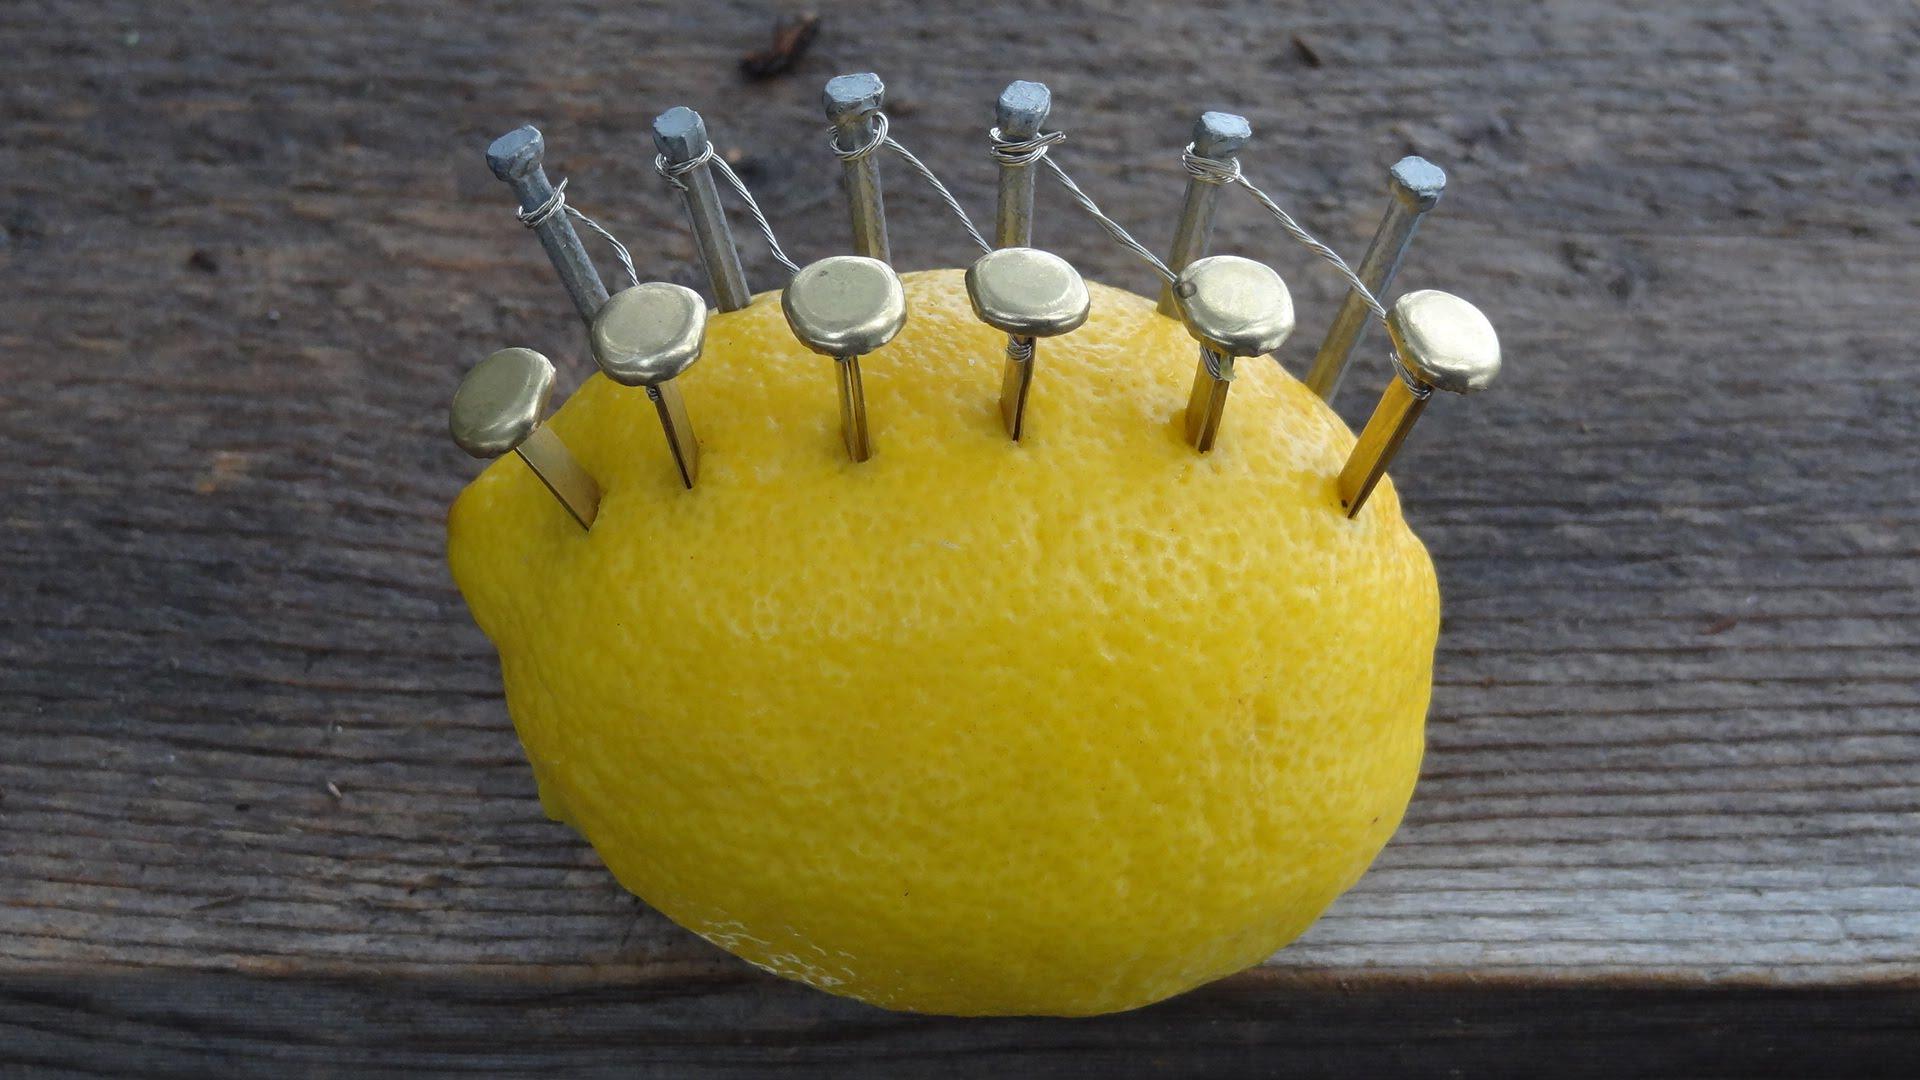 Aprende a hacer una fogata con un limón